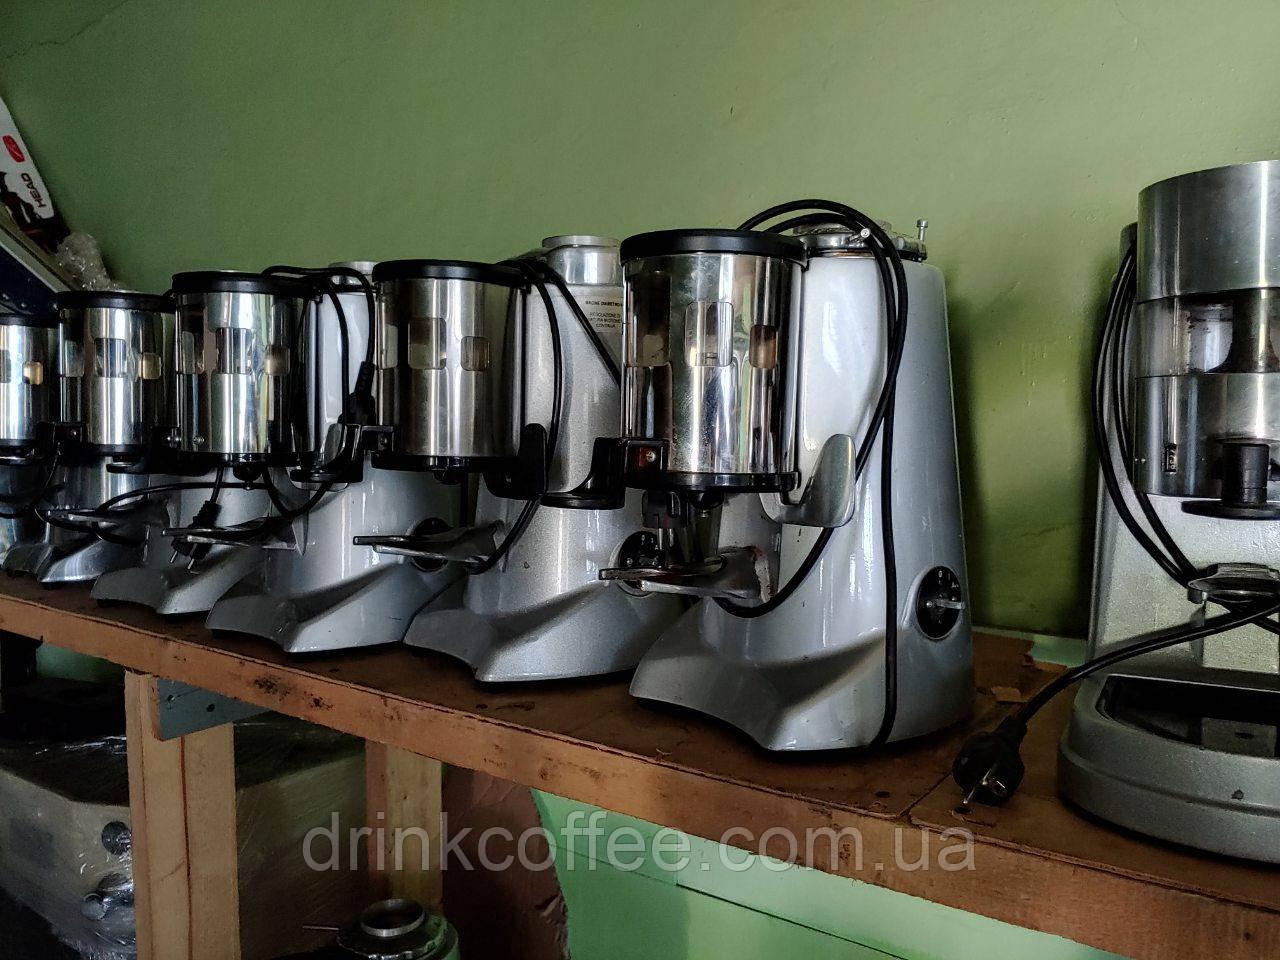 Кофемолка Fiorenzato F5 б/у (новый бункер)